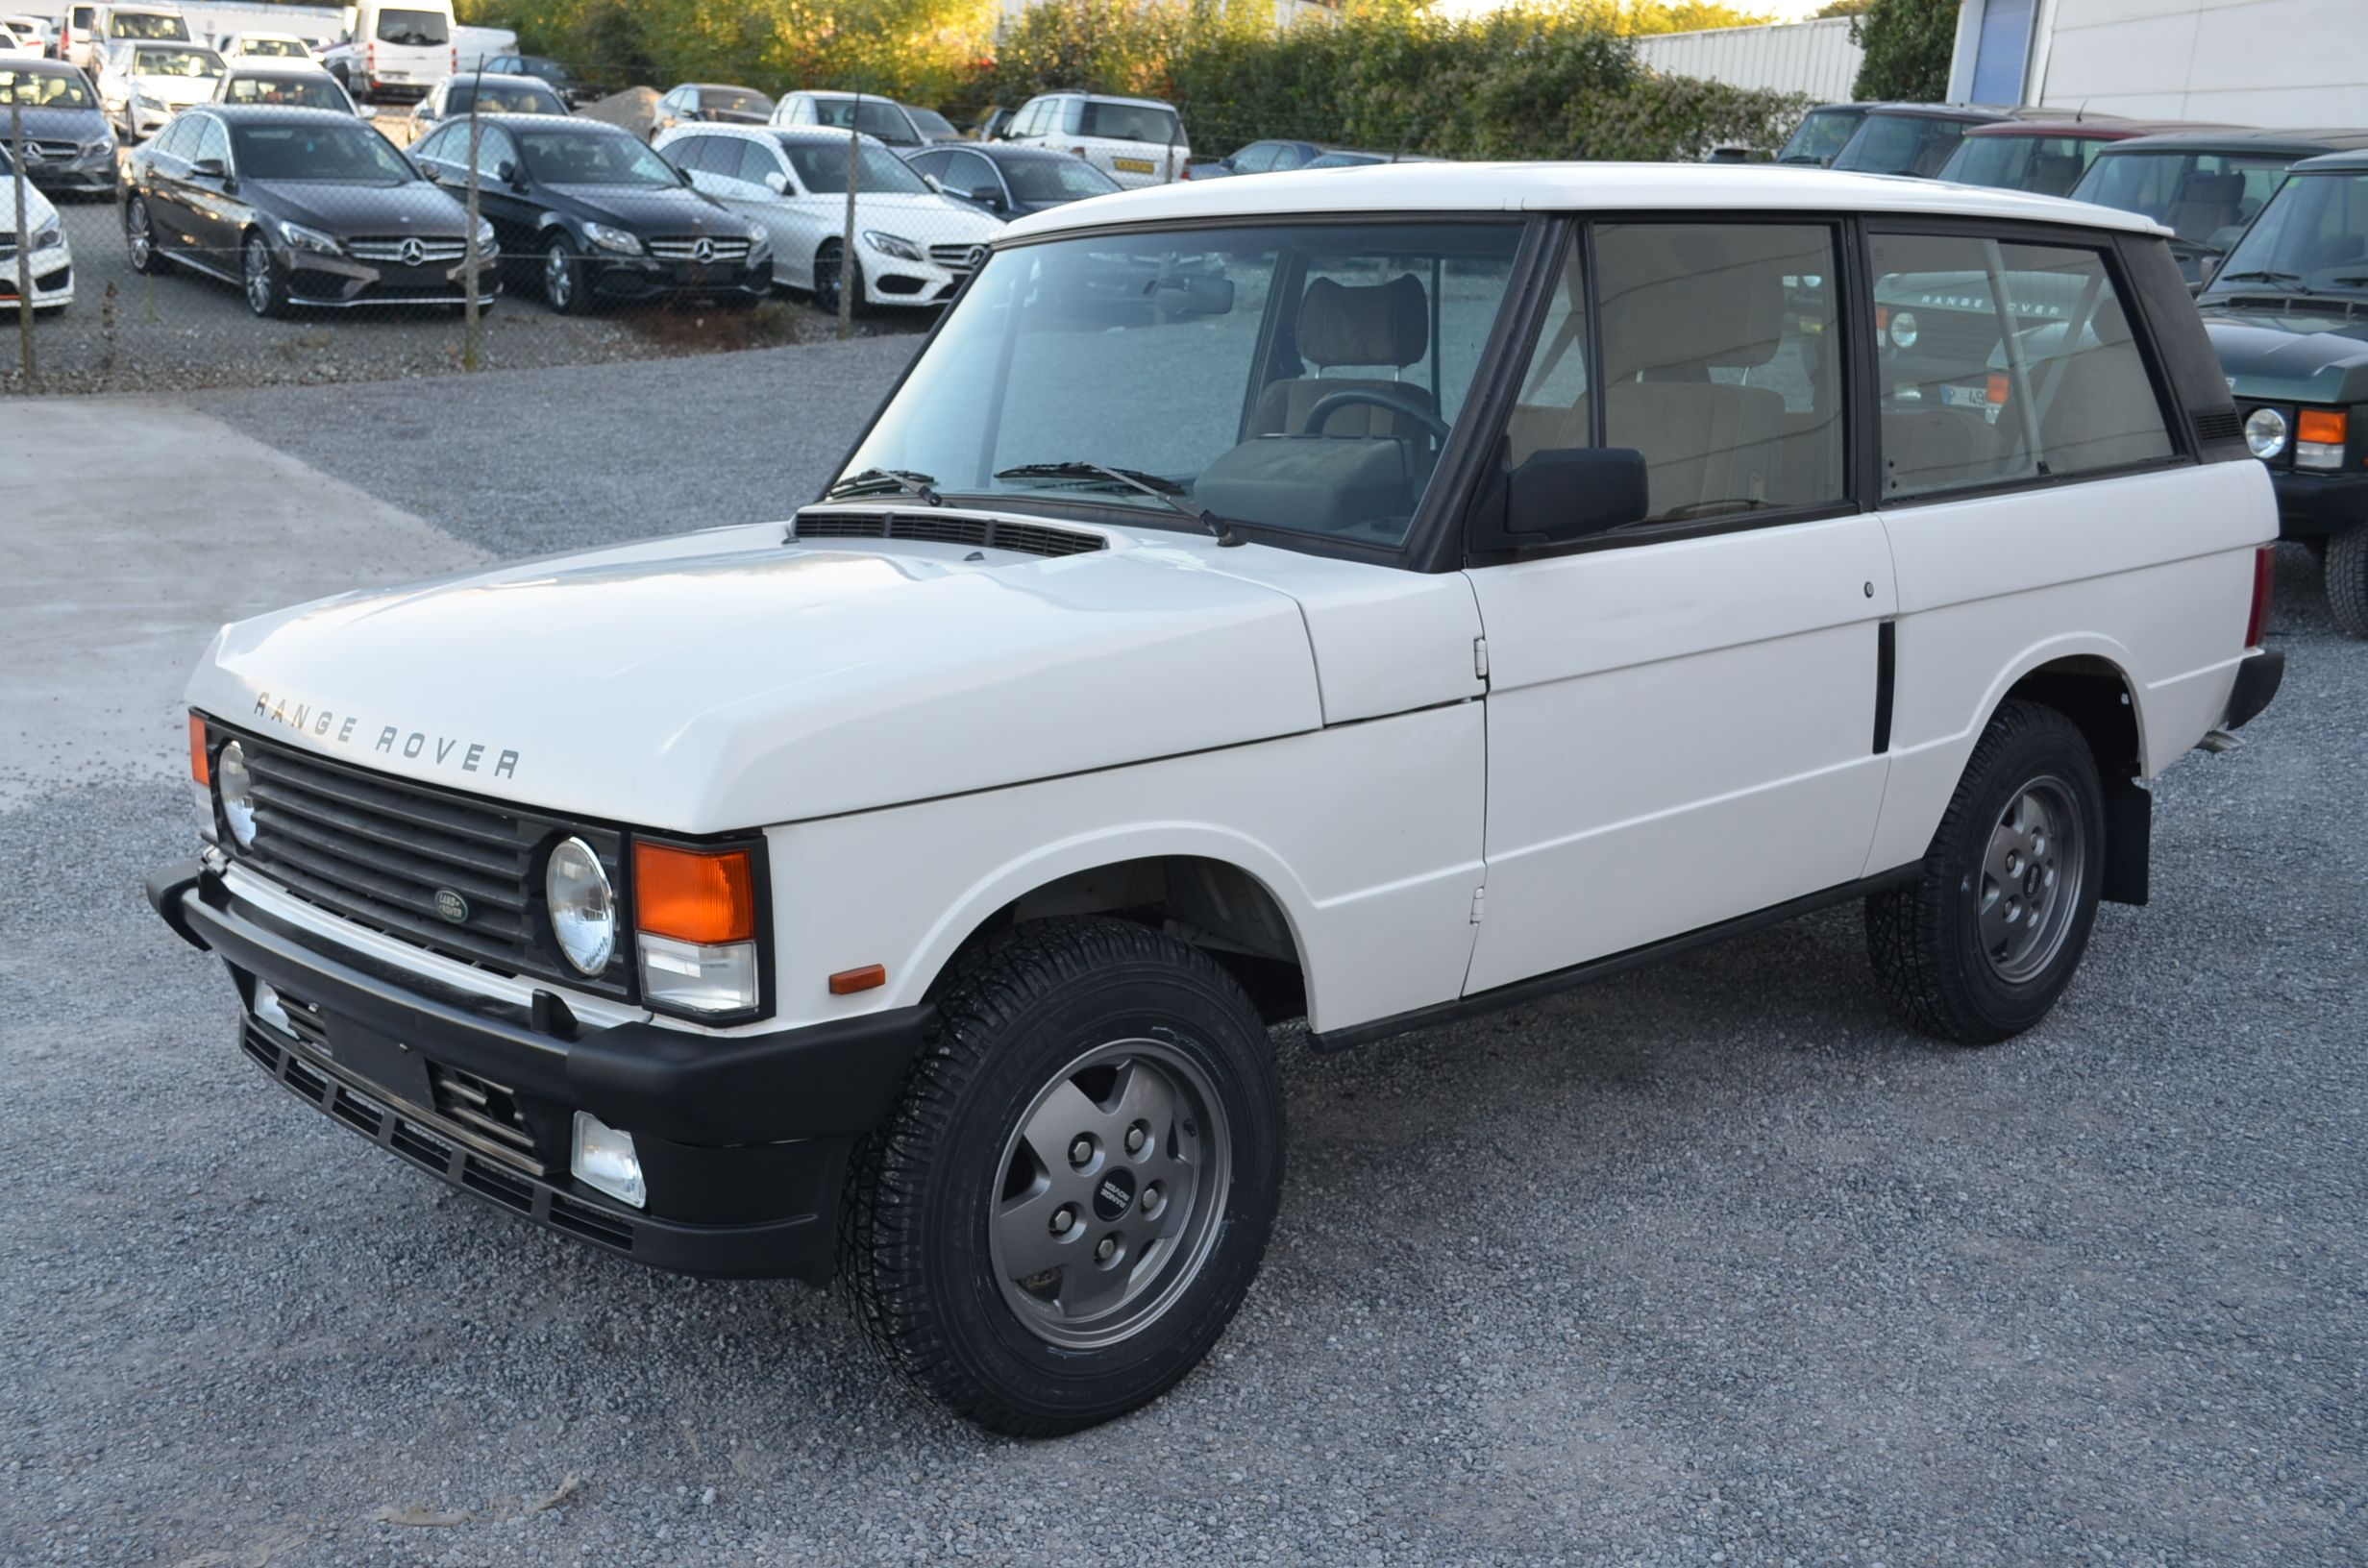 1991 Land Rover Range Rover 3 9l 2 Doors Range Rover Classic Range Rover Land Rover